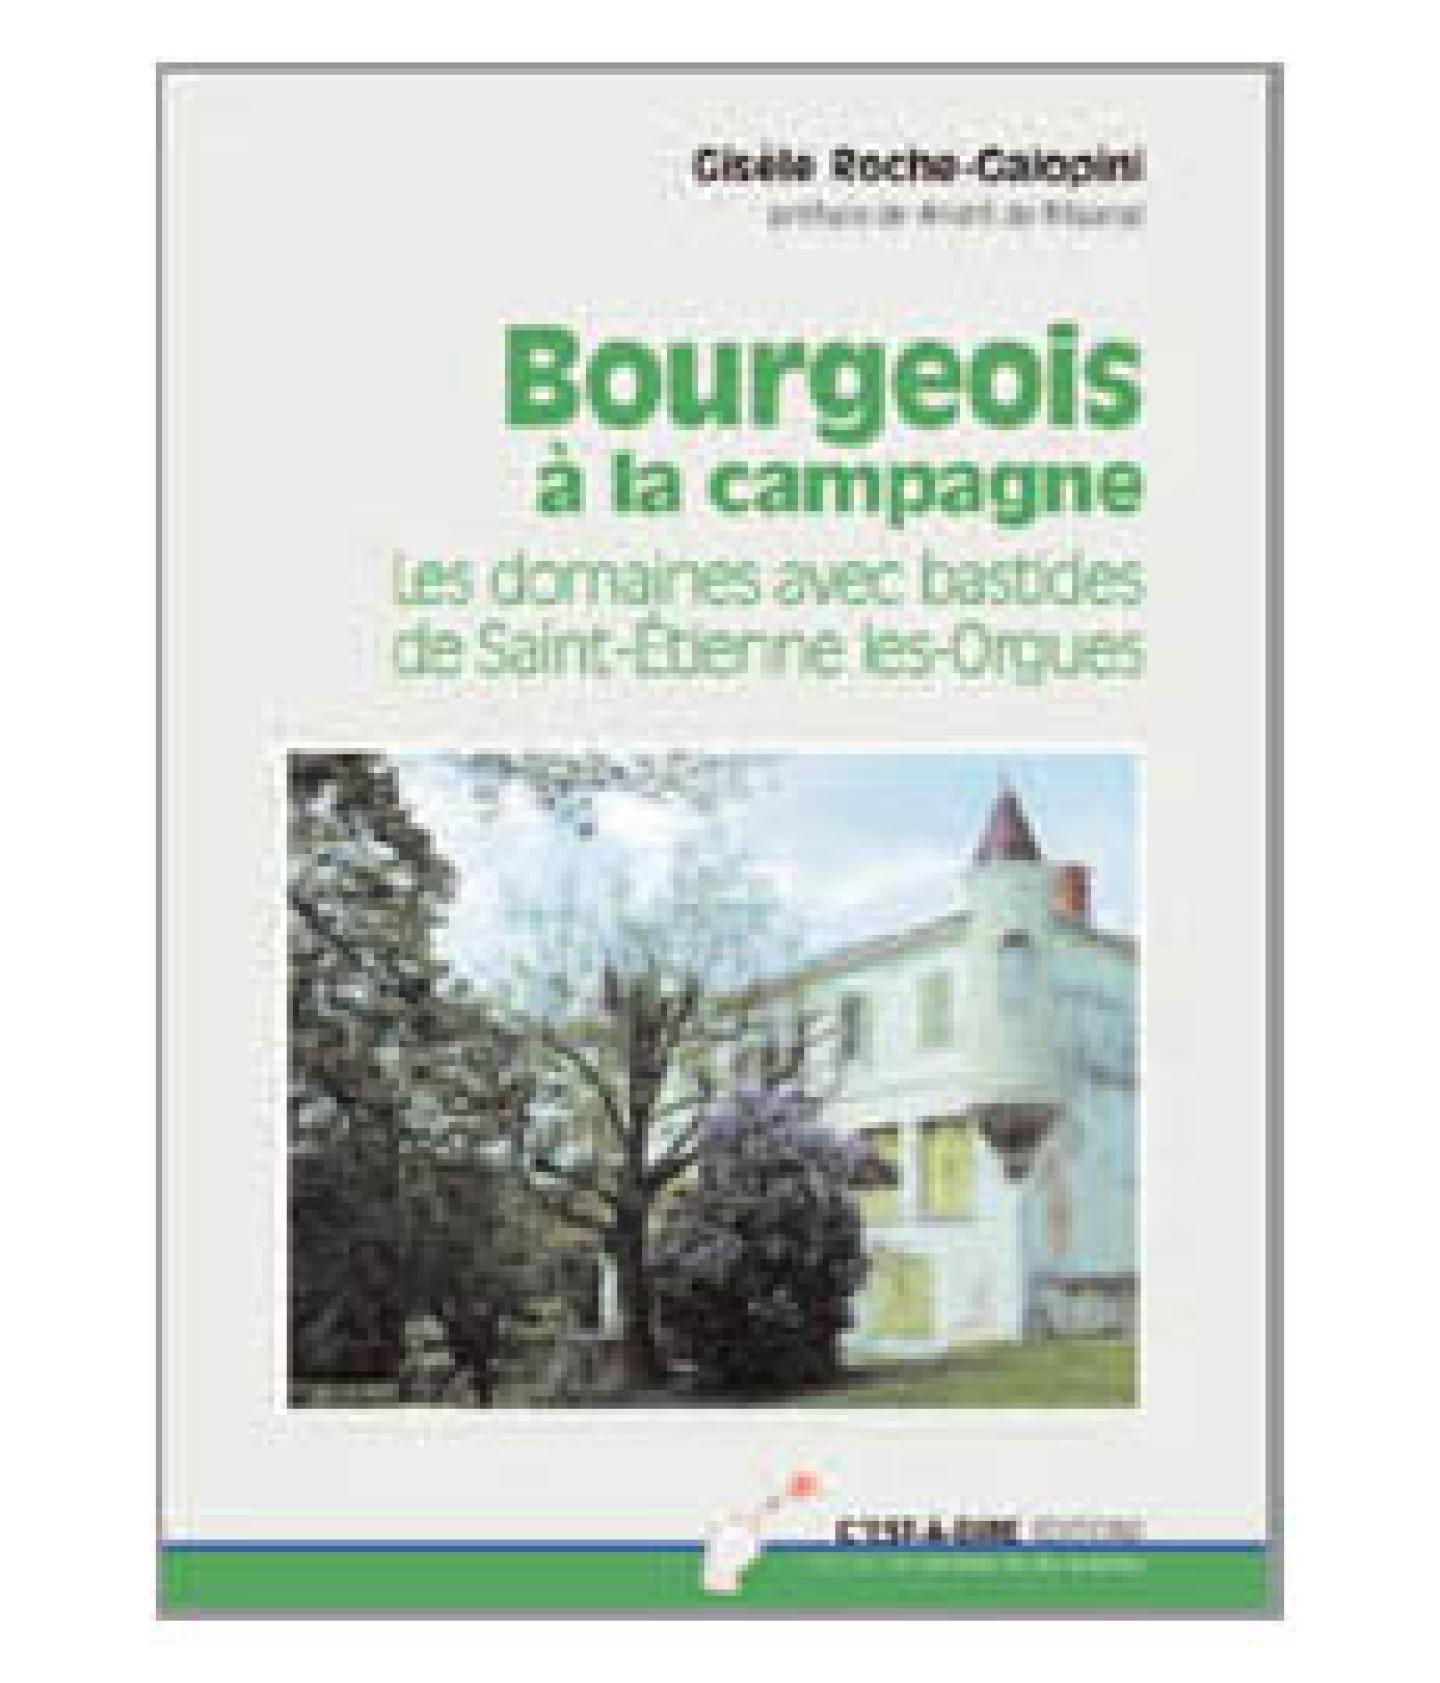 Bourgeois à la campagne de Gisèle Roche-Galopini